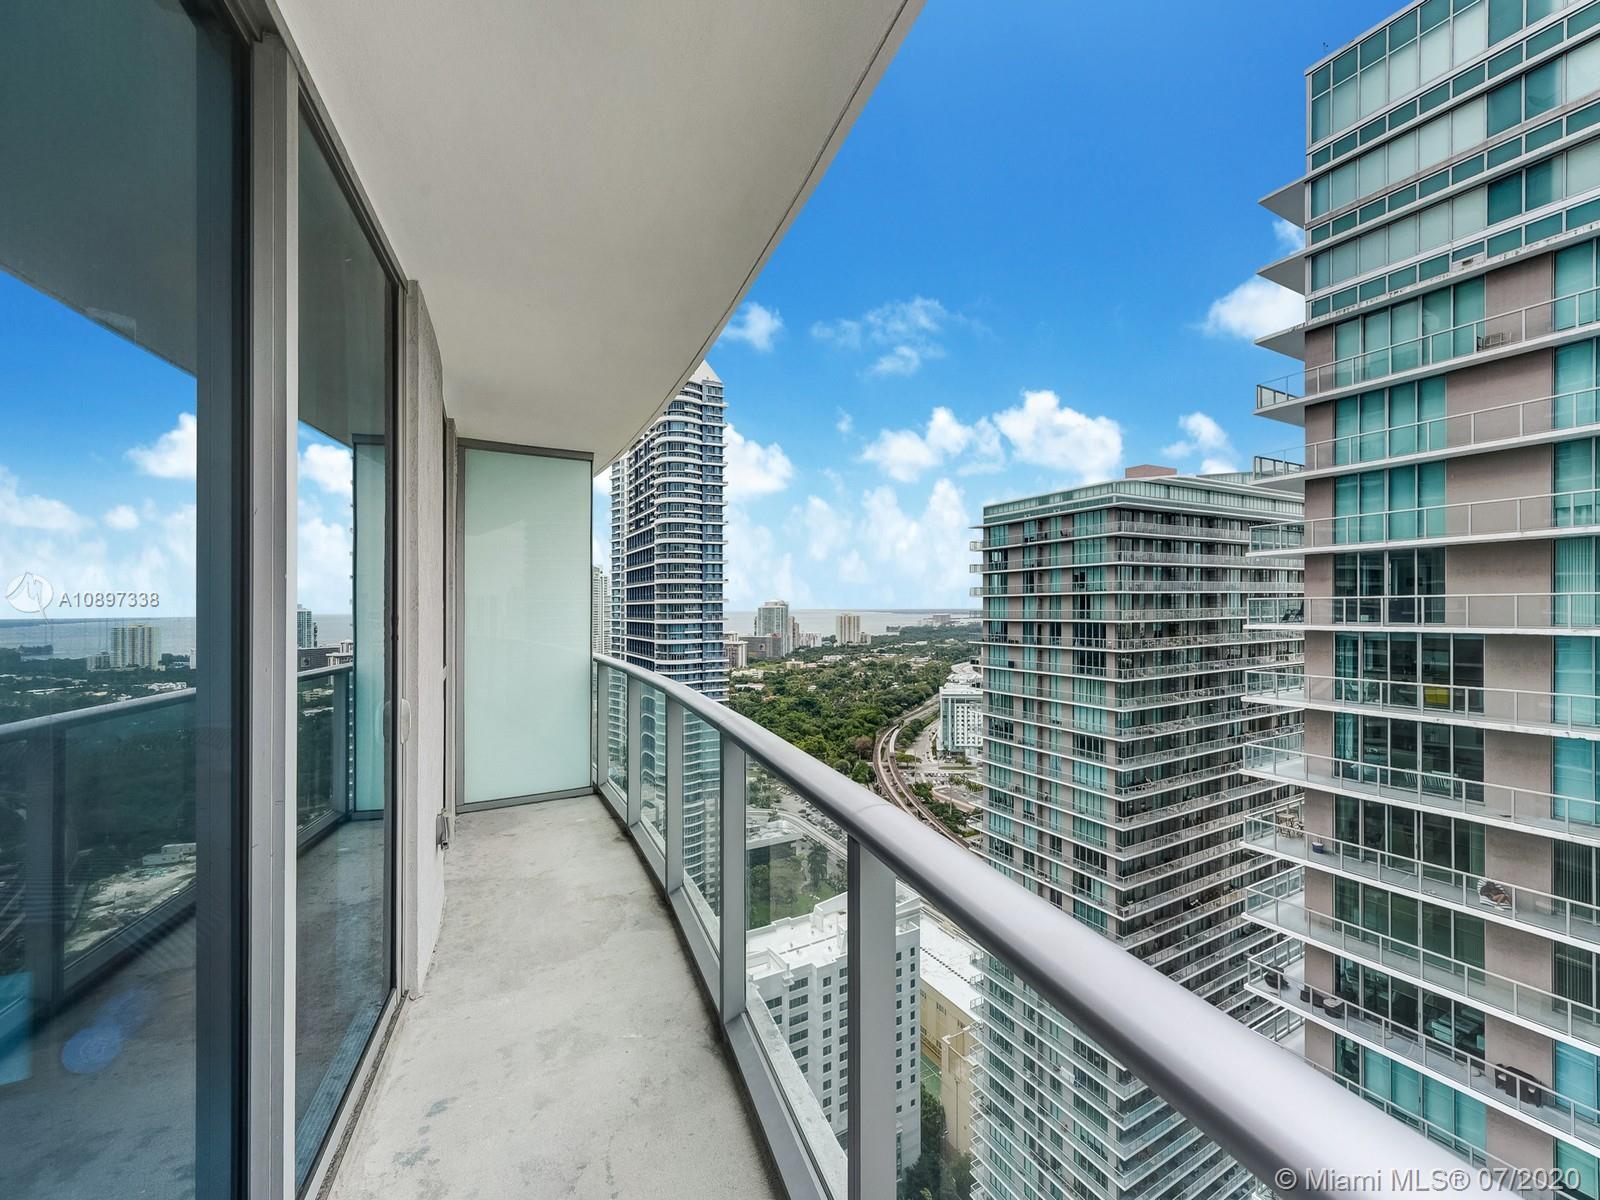 1100 Millecento #3406 - 1100 S Miami Ave #3406, Miami, FL 33130